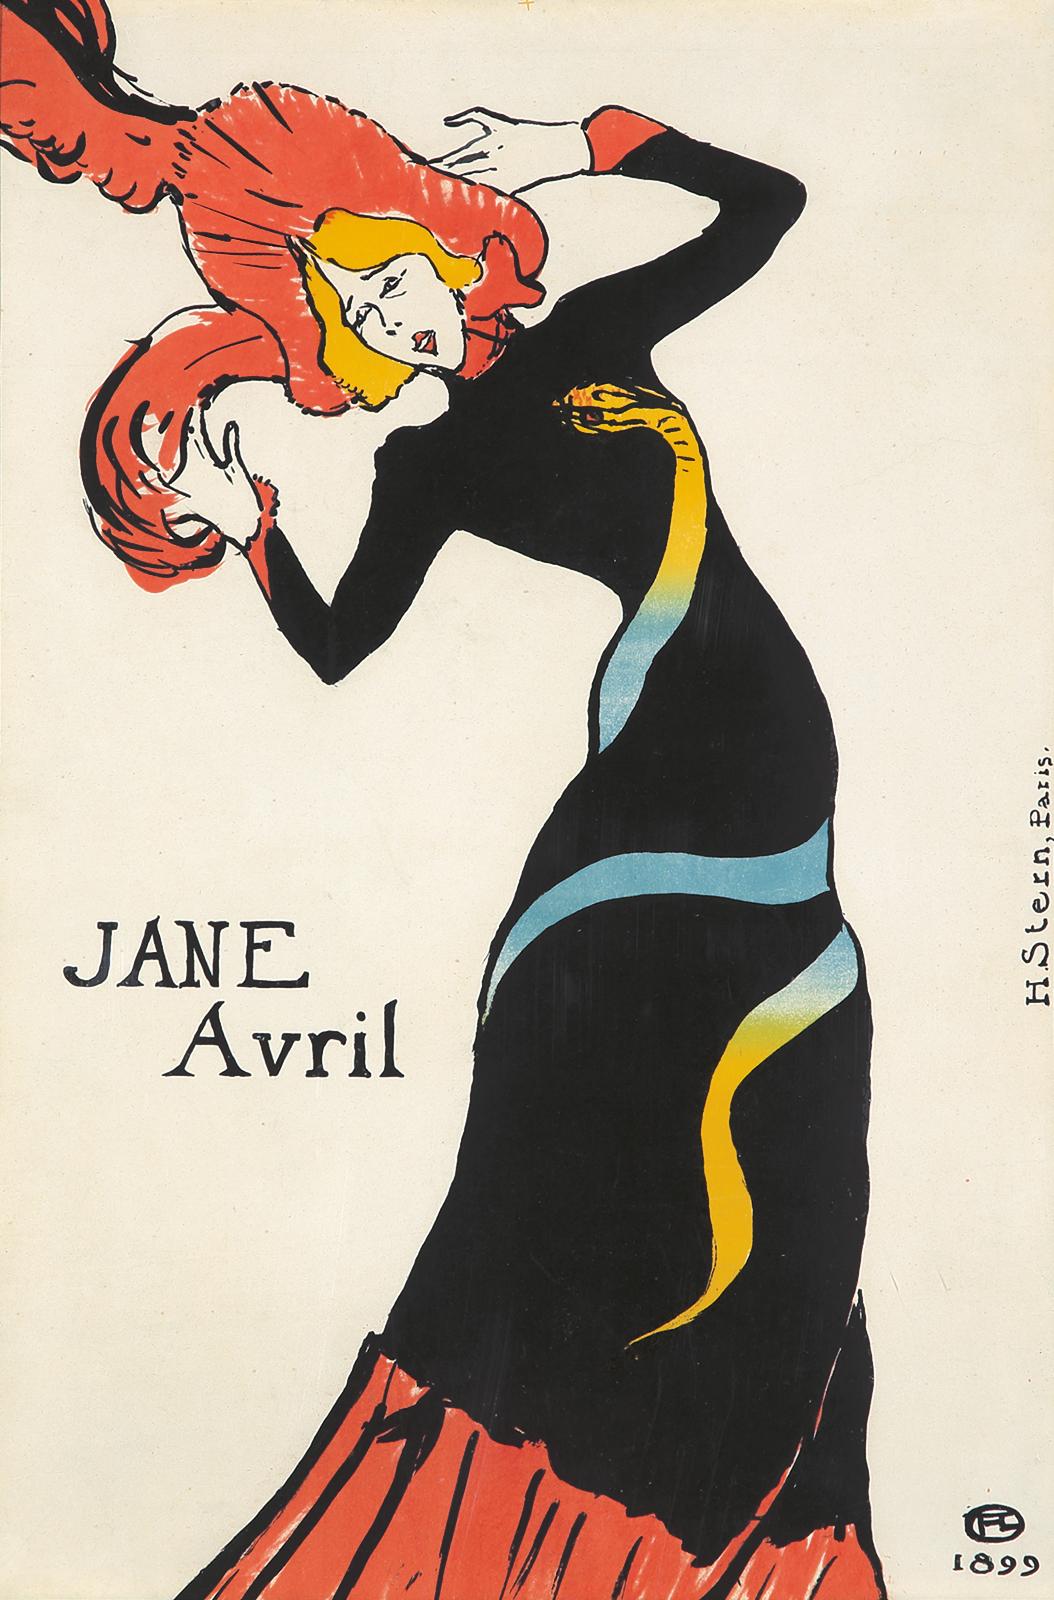 378. Jane Avril. 1899.